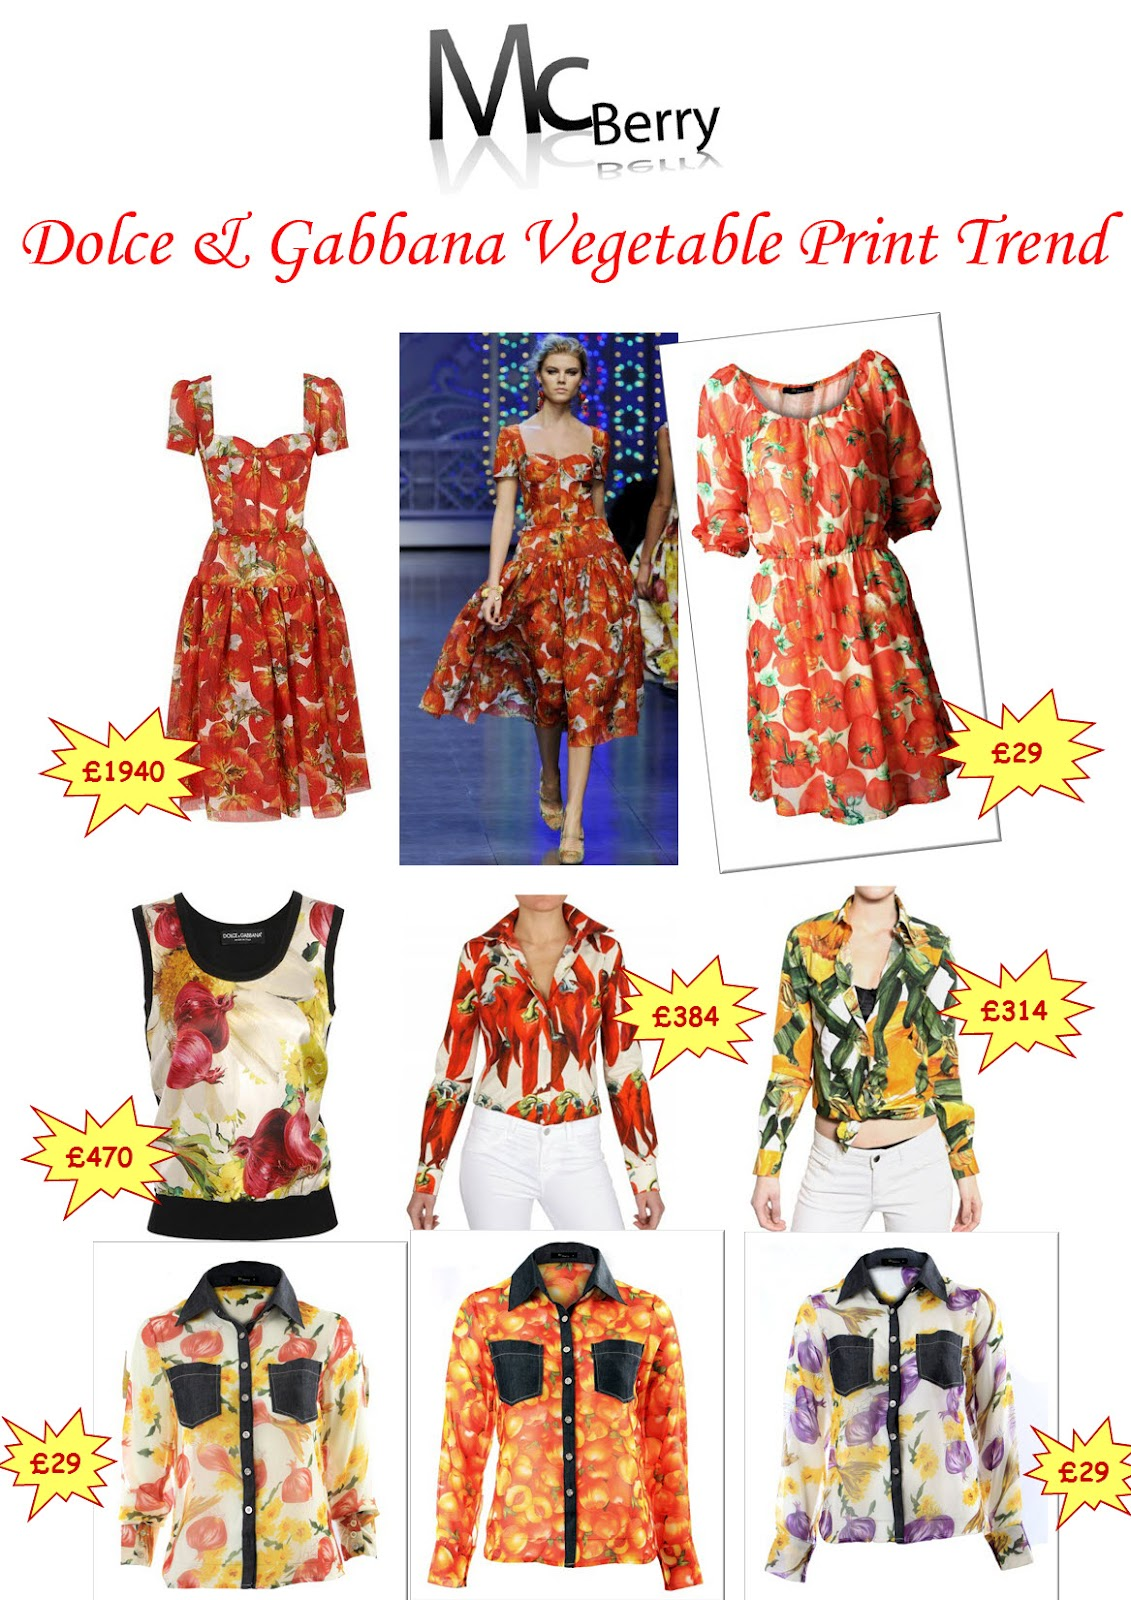 http://3.bp.blogspot.com/-3yc4ImIo6jQ/T74mj1e7LLI/AAAAAAAAAbo/zcYcwI04Skw/s1600/Looksheet+Dolce+&+Gabbana+Vegetable+Print+Trend.jpg